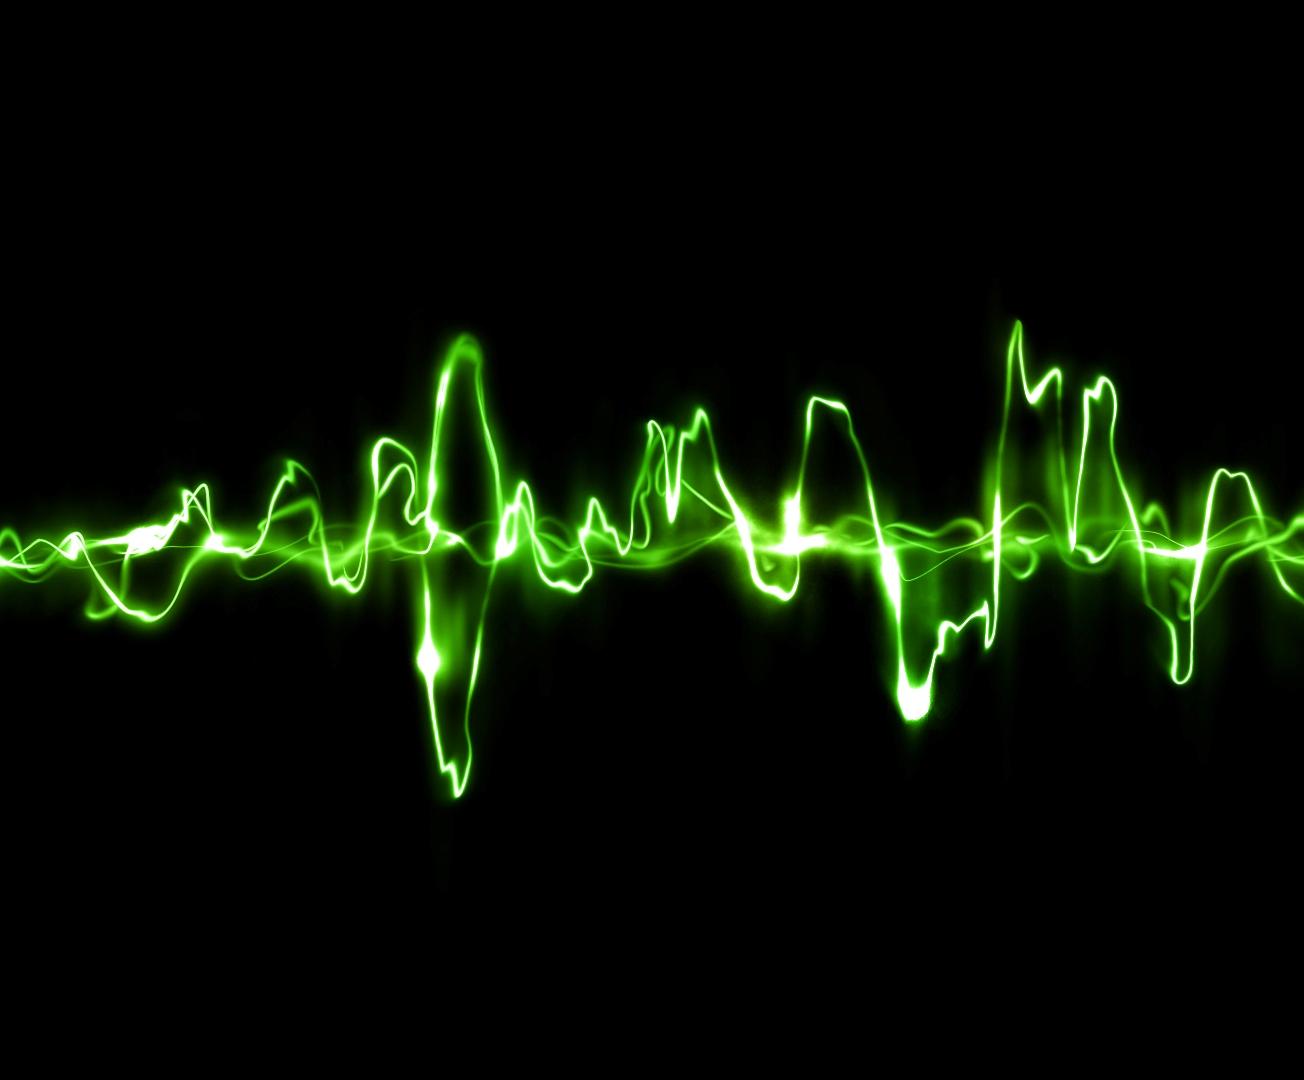 zlab-acoustics-laboratory-rams-analysis-industry-sound-wave